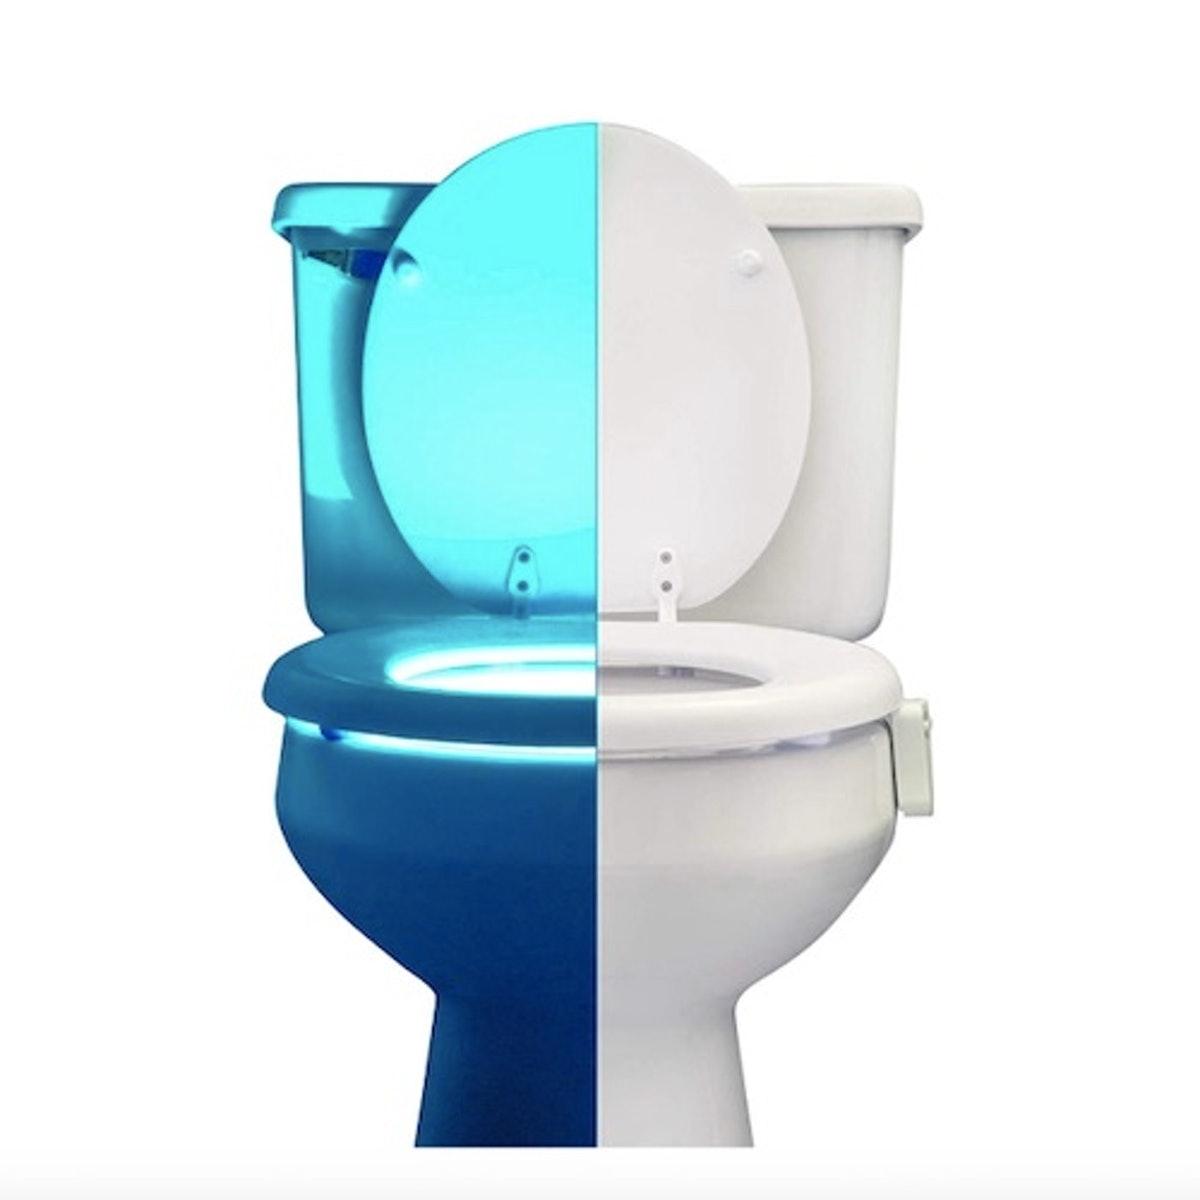 RainBowl Motion Sensor Toilet Night Light